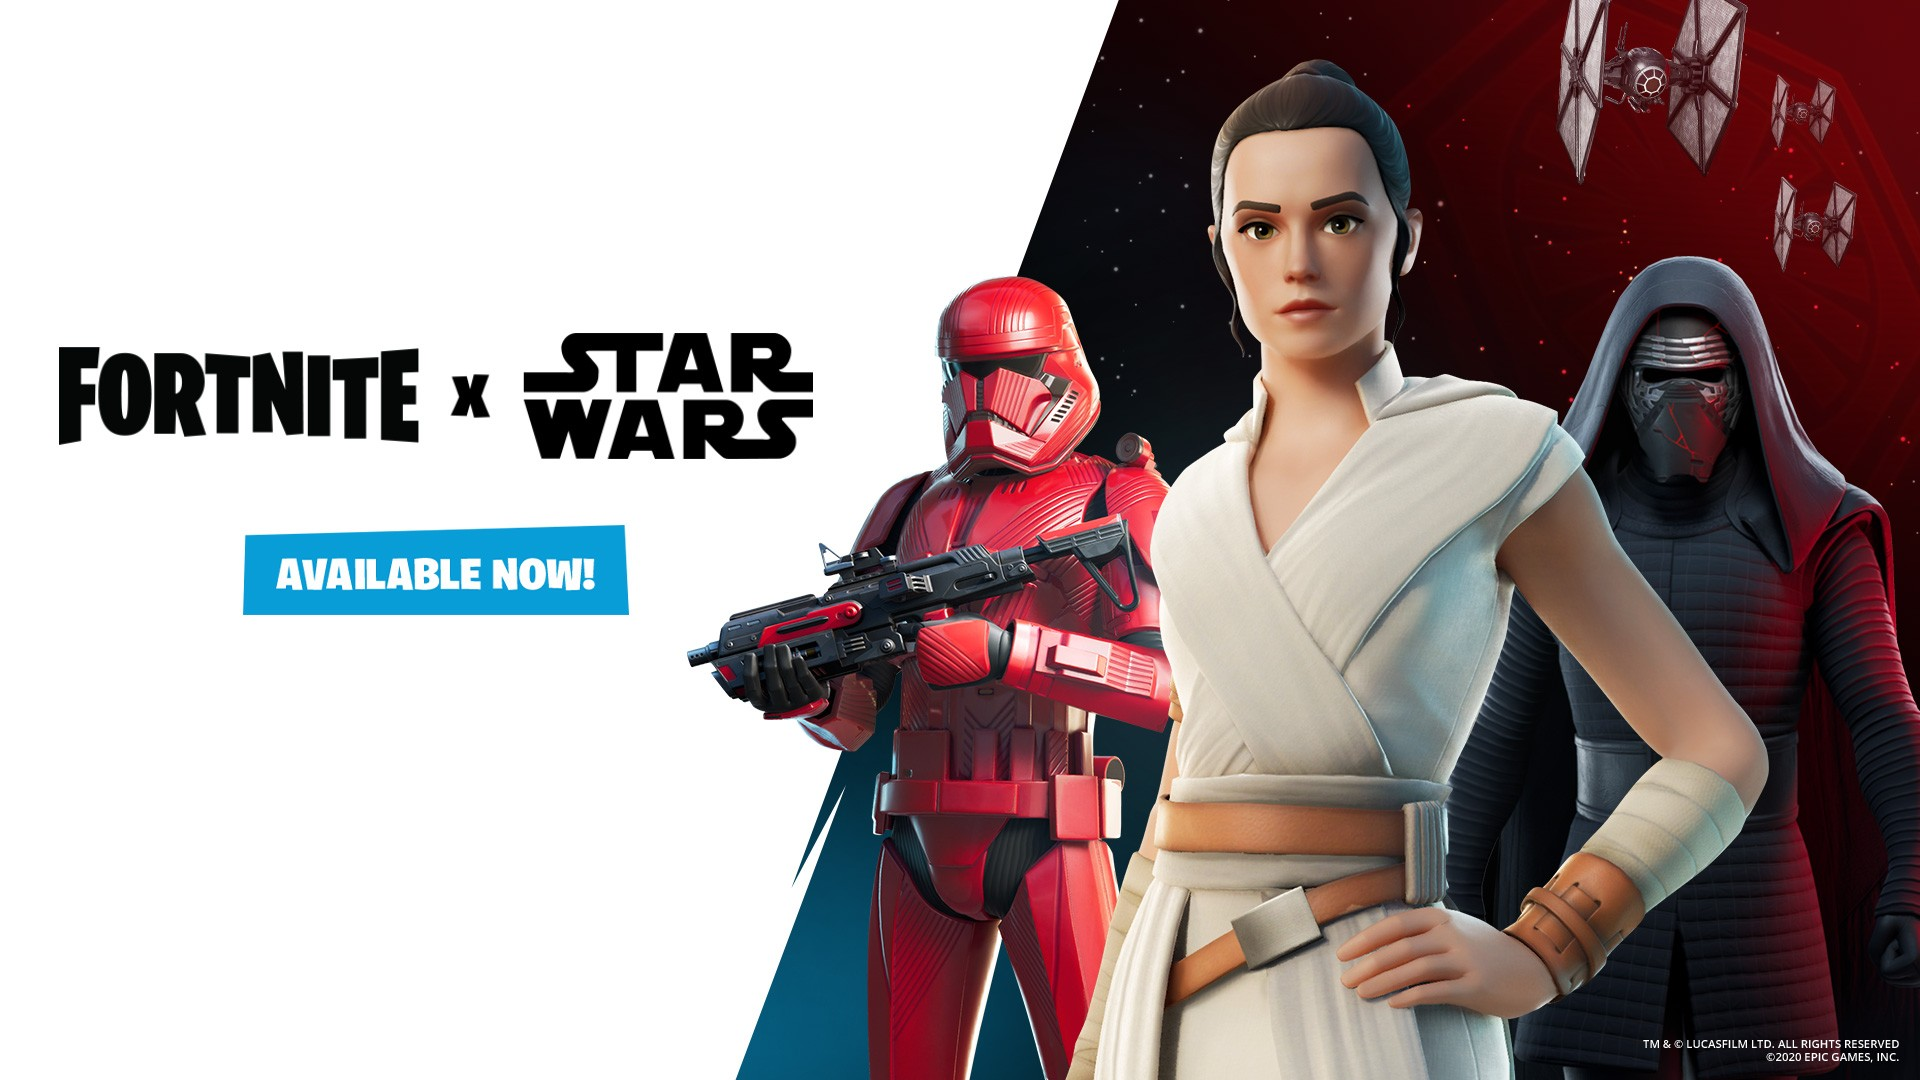 Fortnite - Star Wars Hero Image